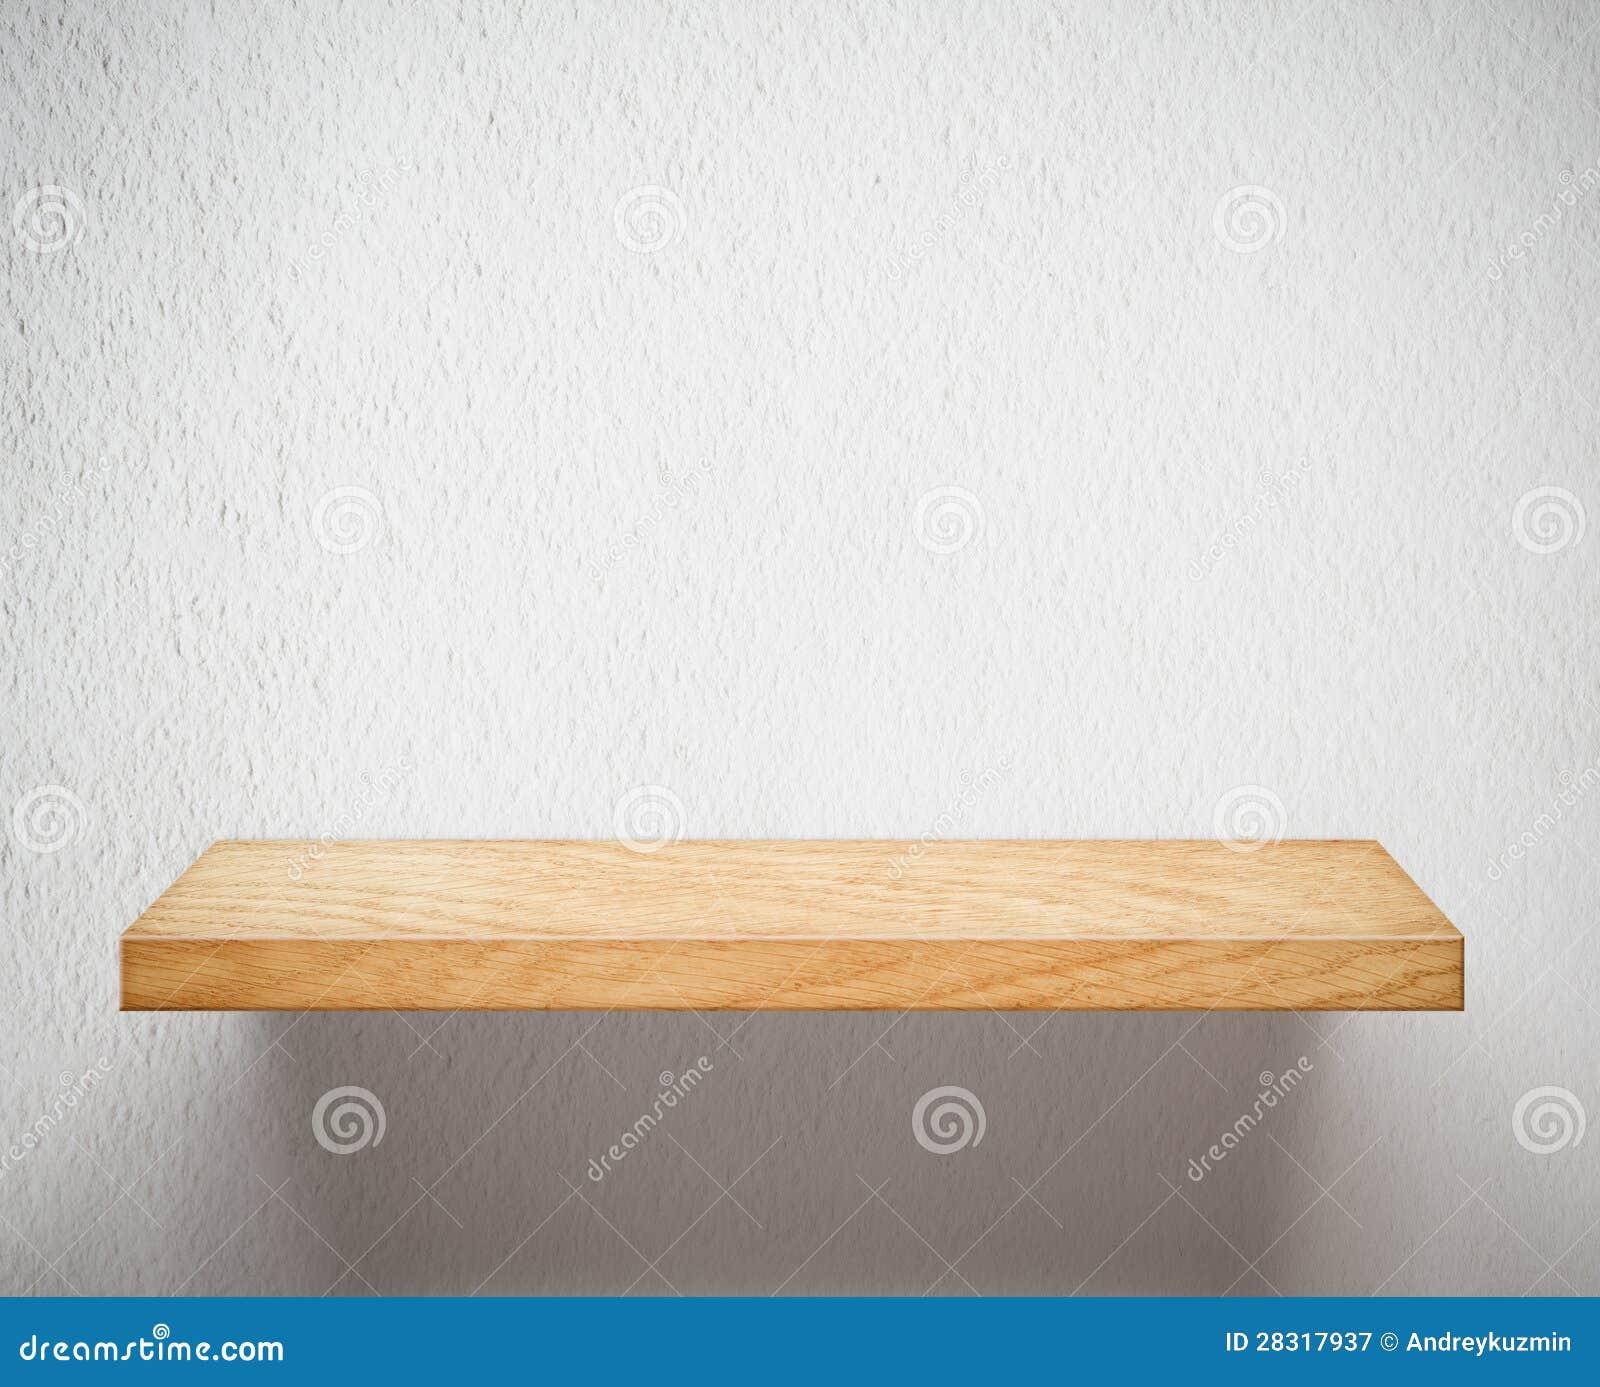 Empty Wooden Shelf Or Bookshelf On White Wall Stock Image ...